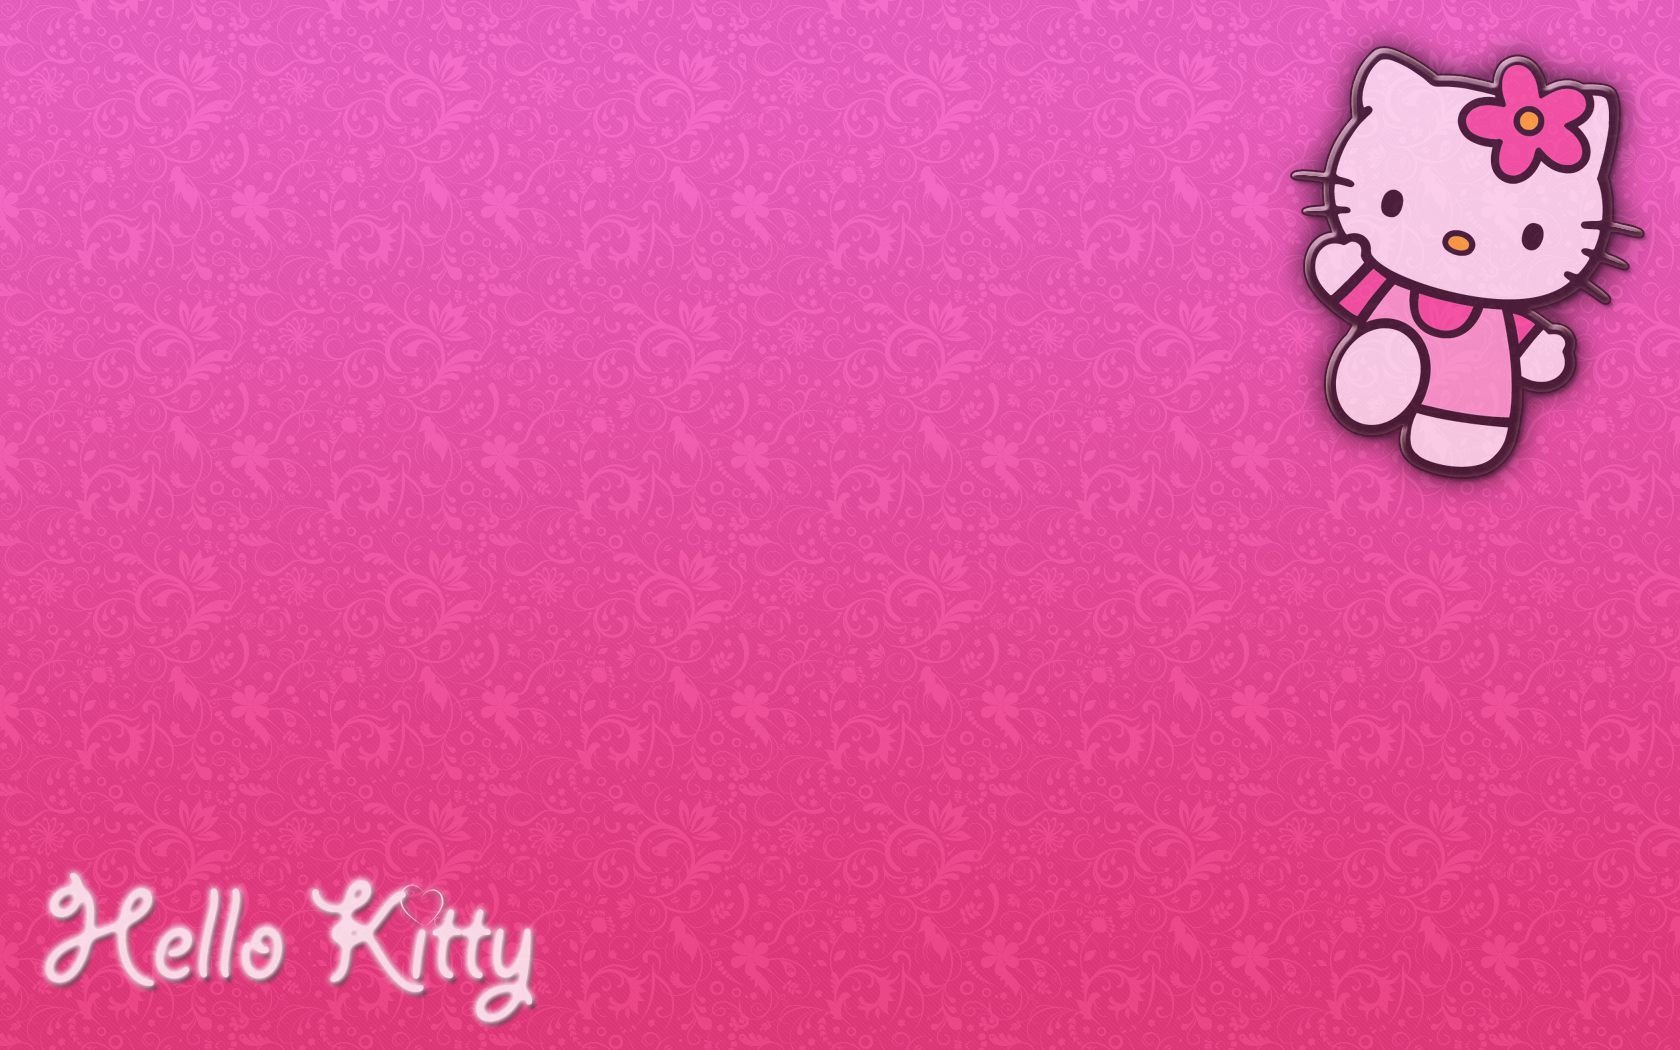 49 ] Cute Hello Kitty Wallpaper Desktop On WallpaperSafari